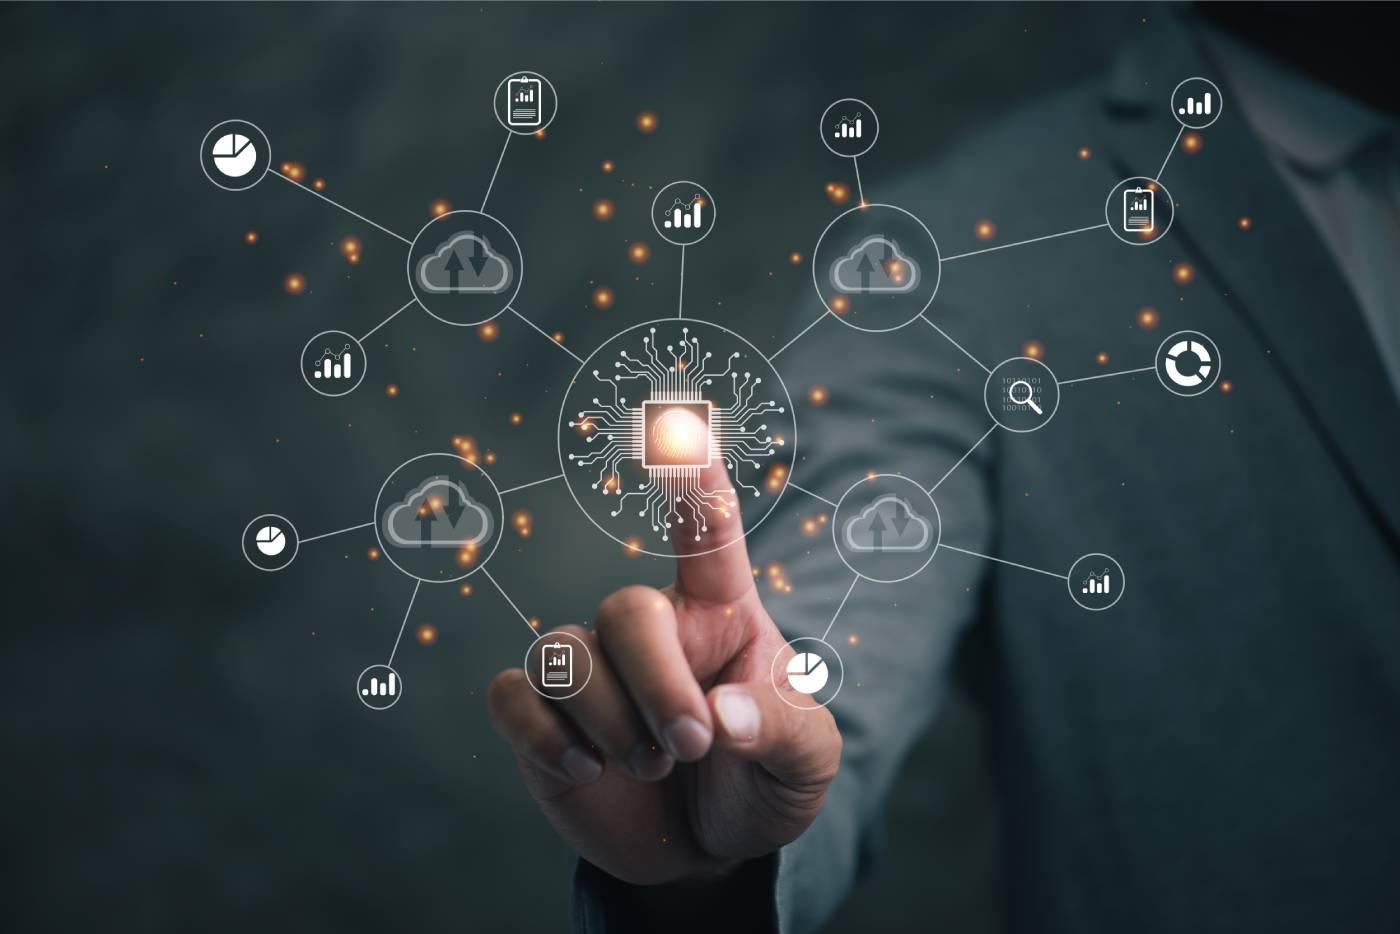 Enterprise Data Management Best Practices for Your Organization